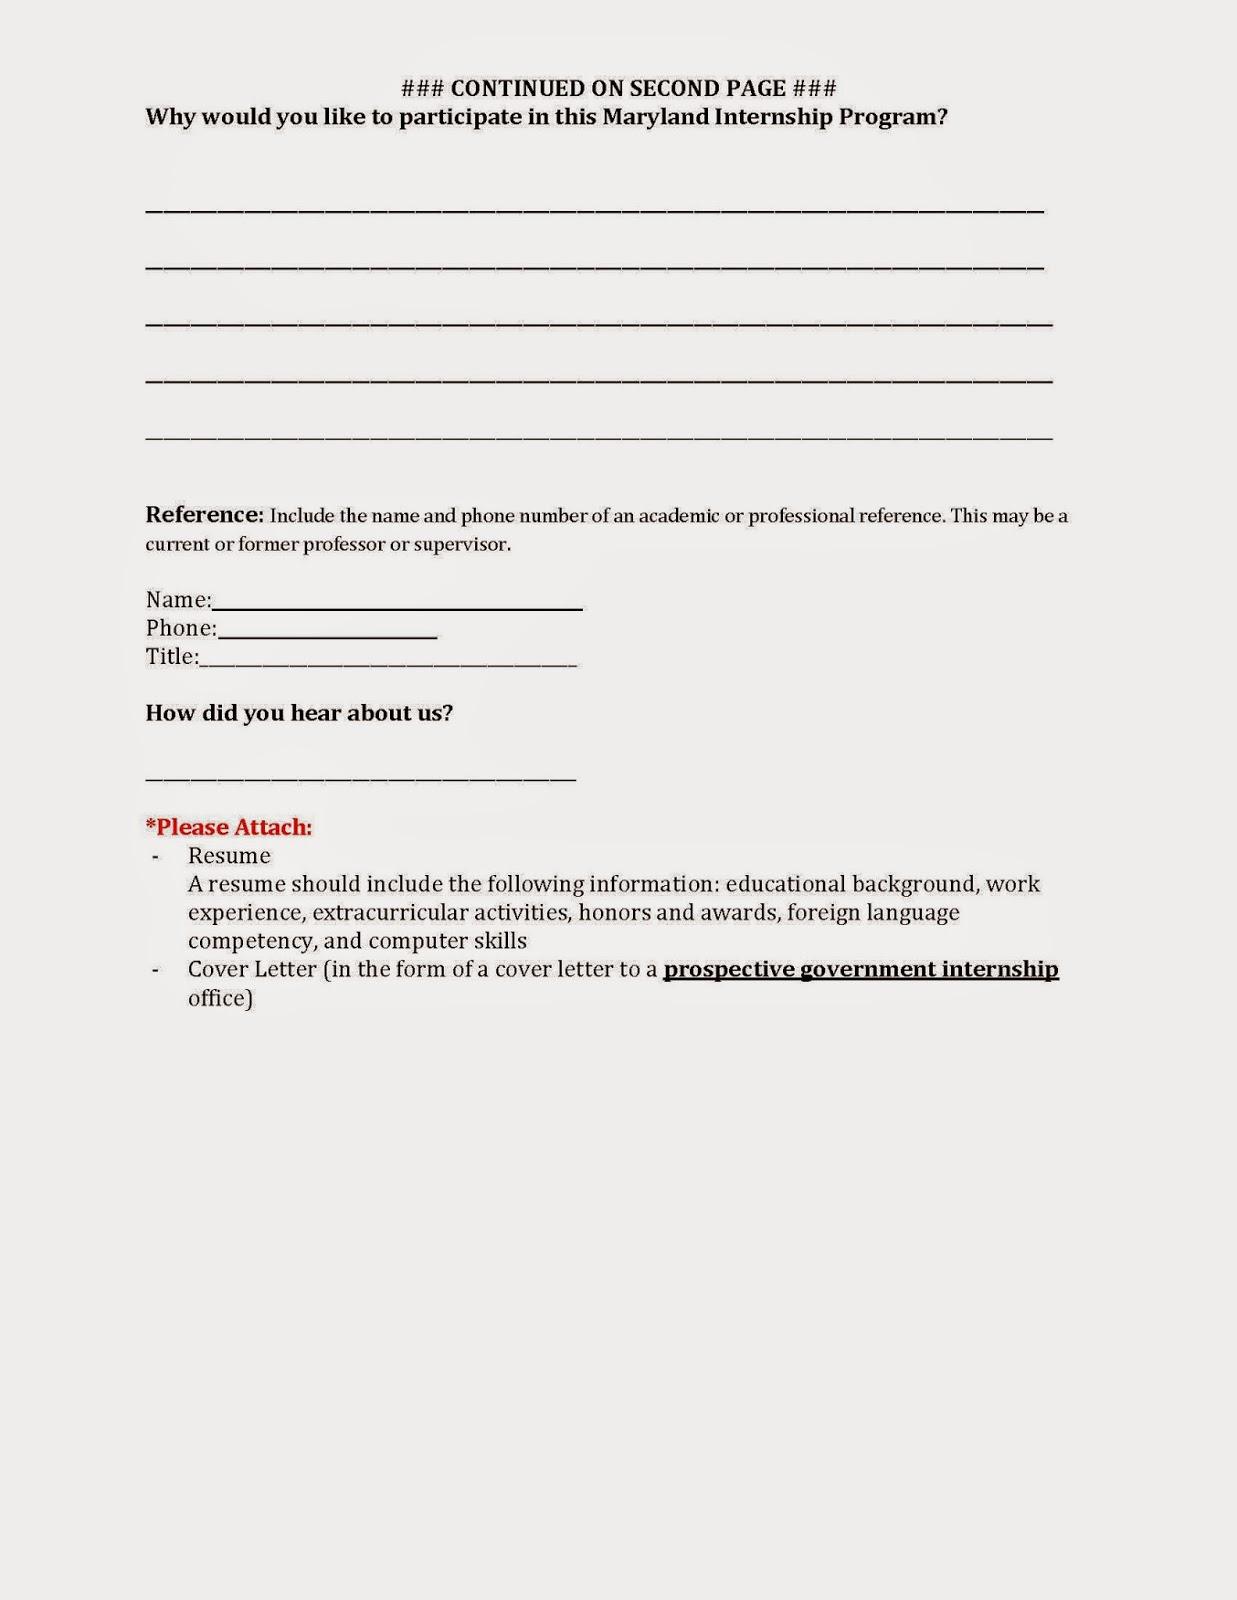 should include cover letter resume resume template cover should include cover letter resume ccjs undergrad blog posted ccjs advising